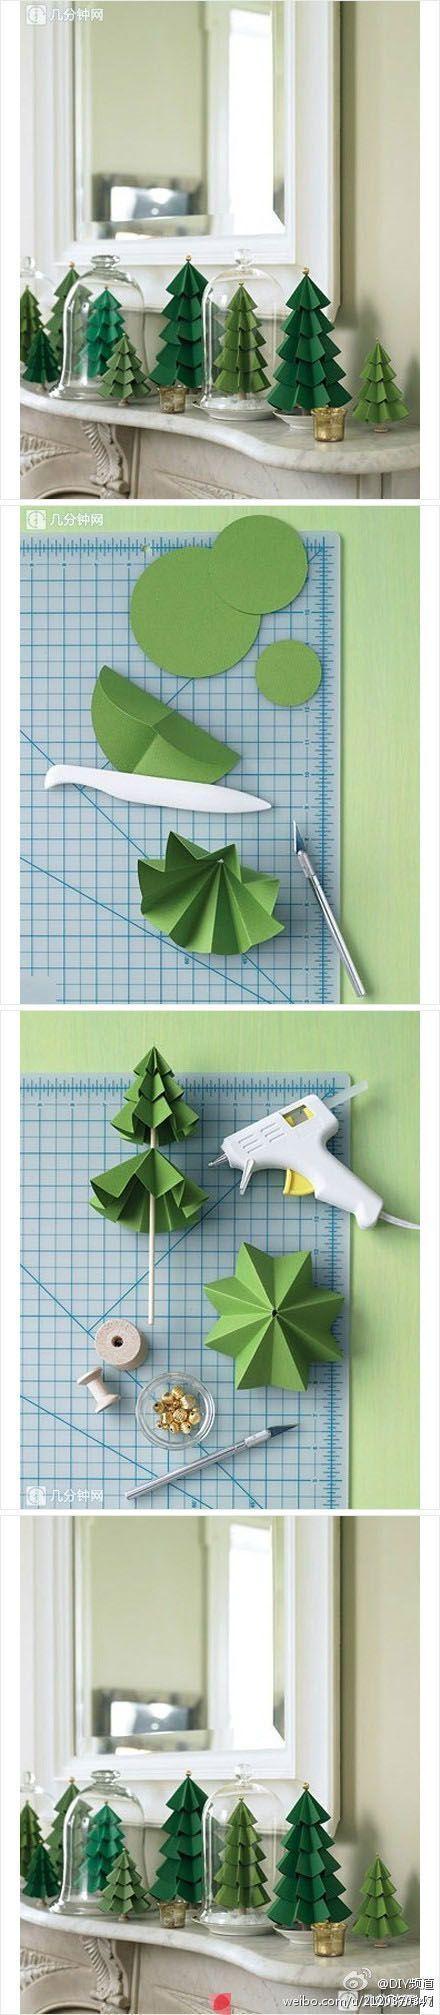 Make Christmas trees from circles